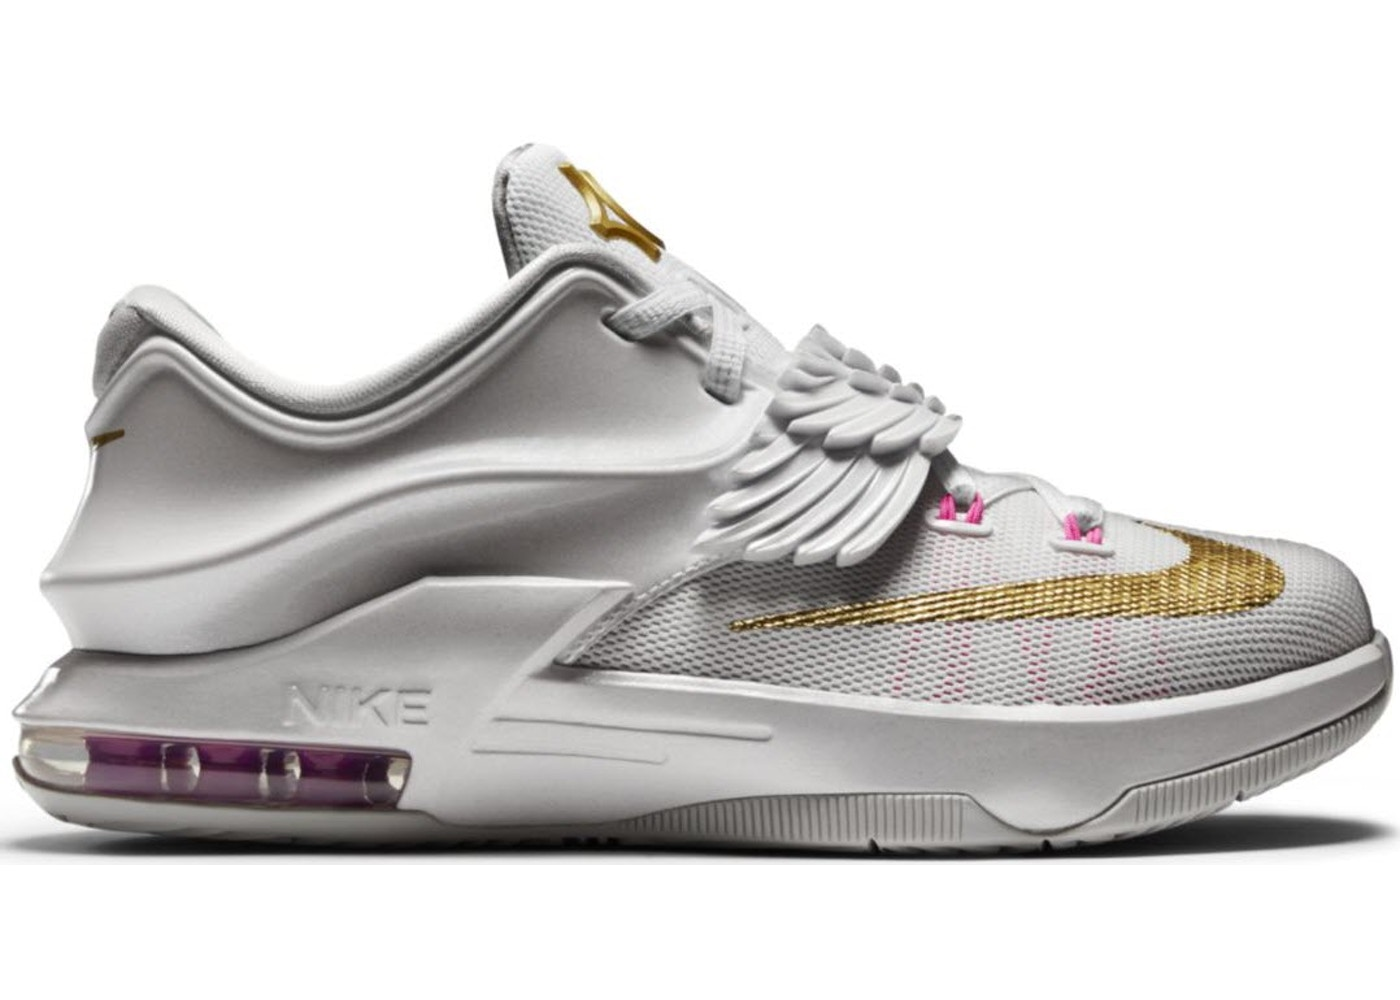 Nike KD 7 Shoes - Price Premium c7537bfe3357